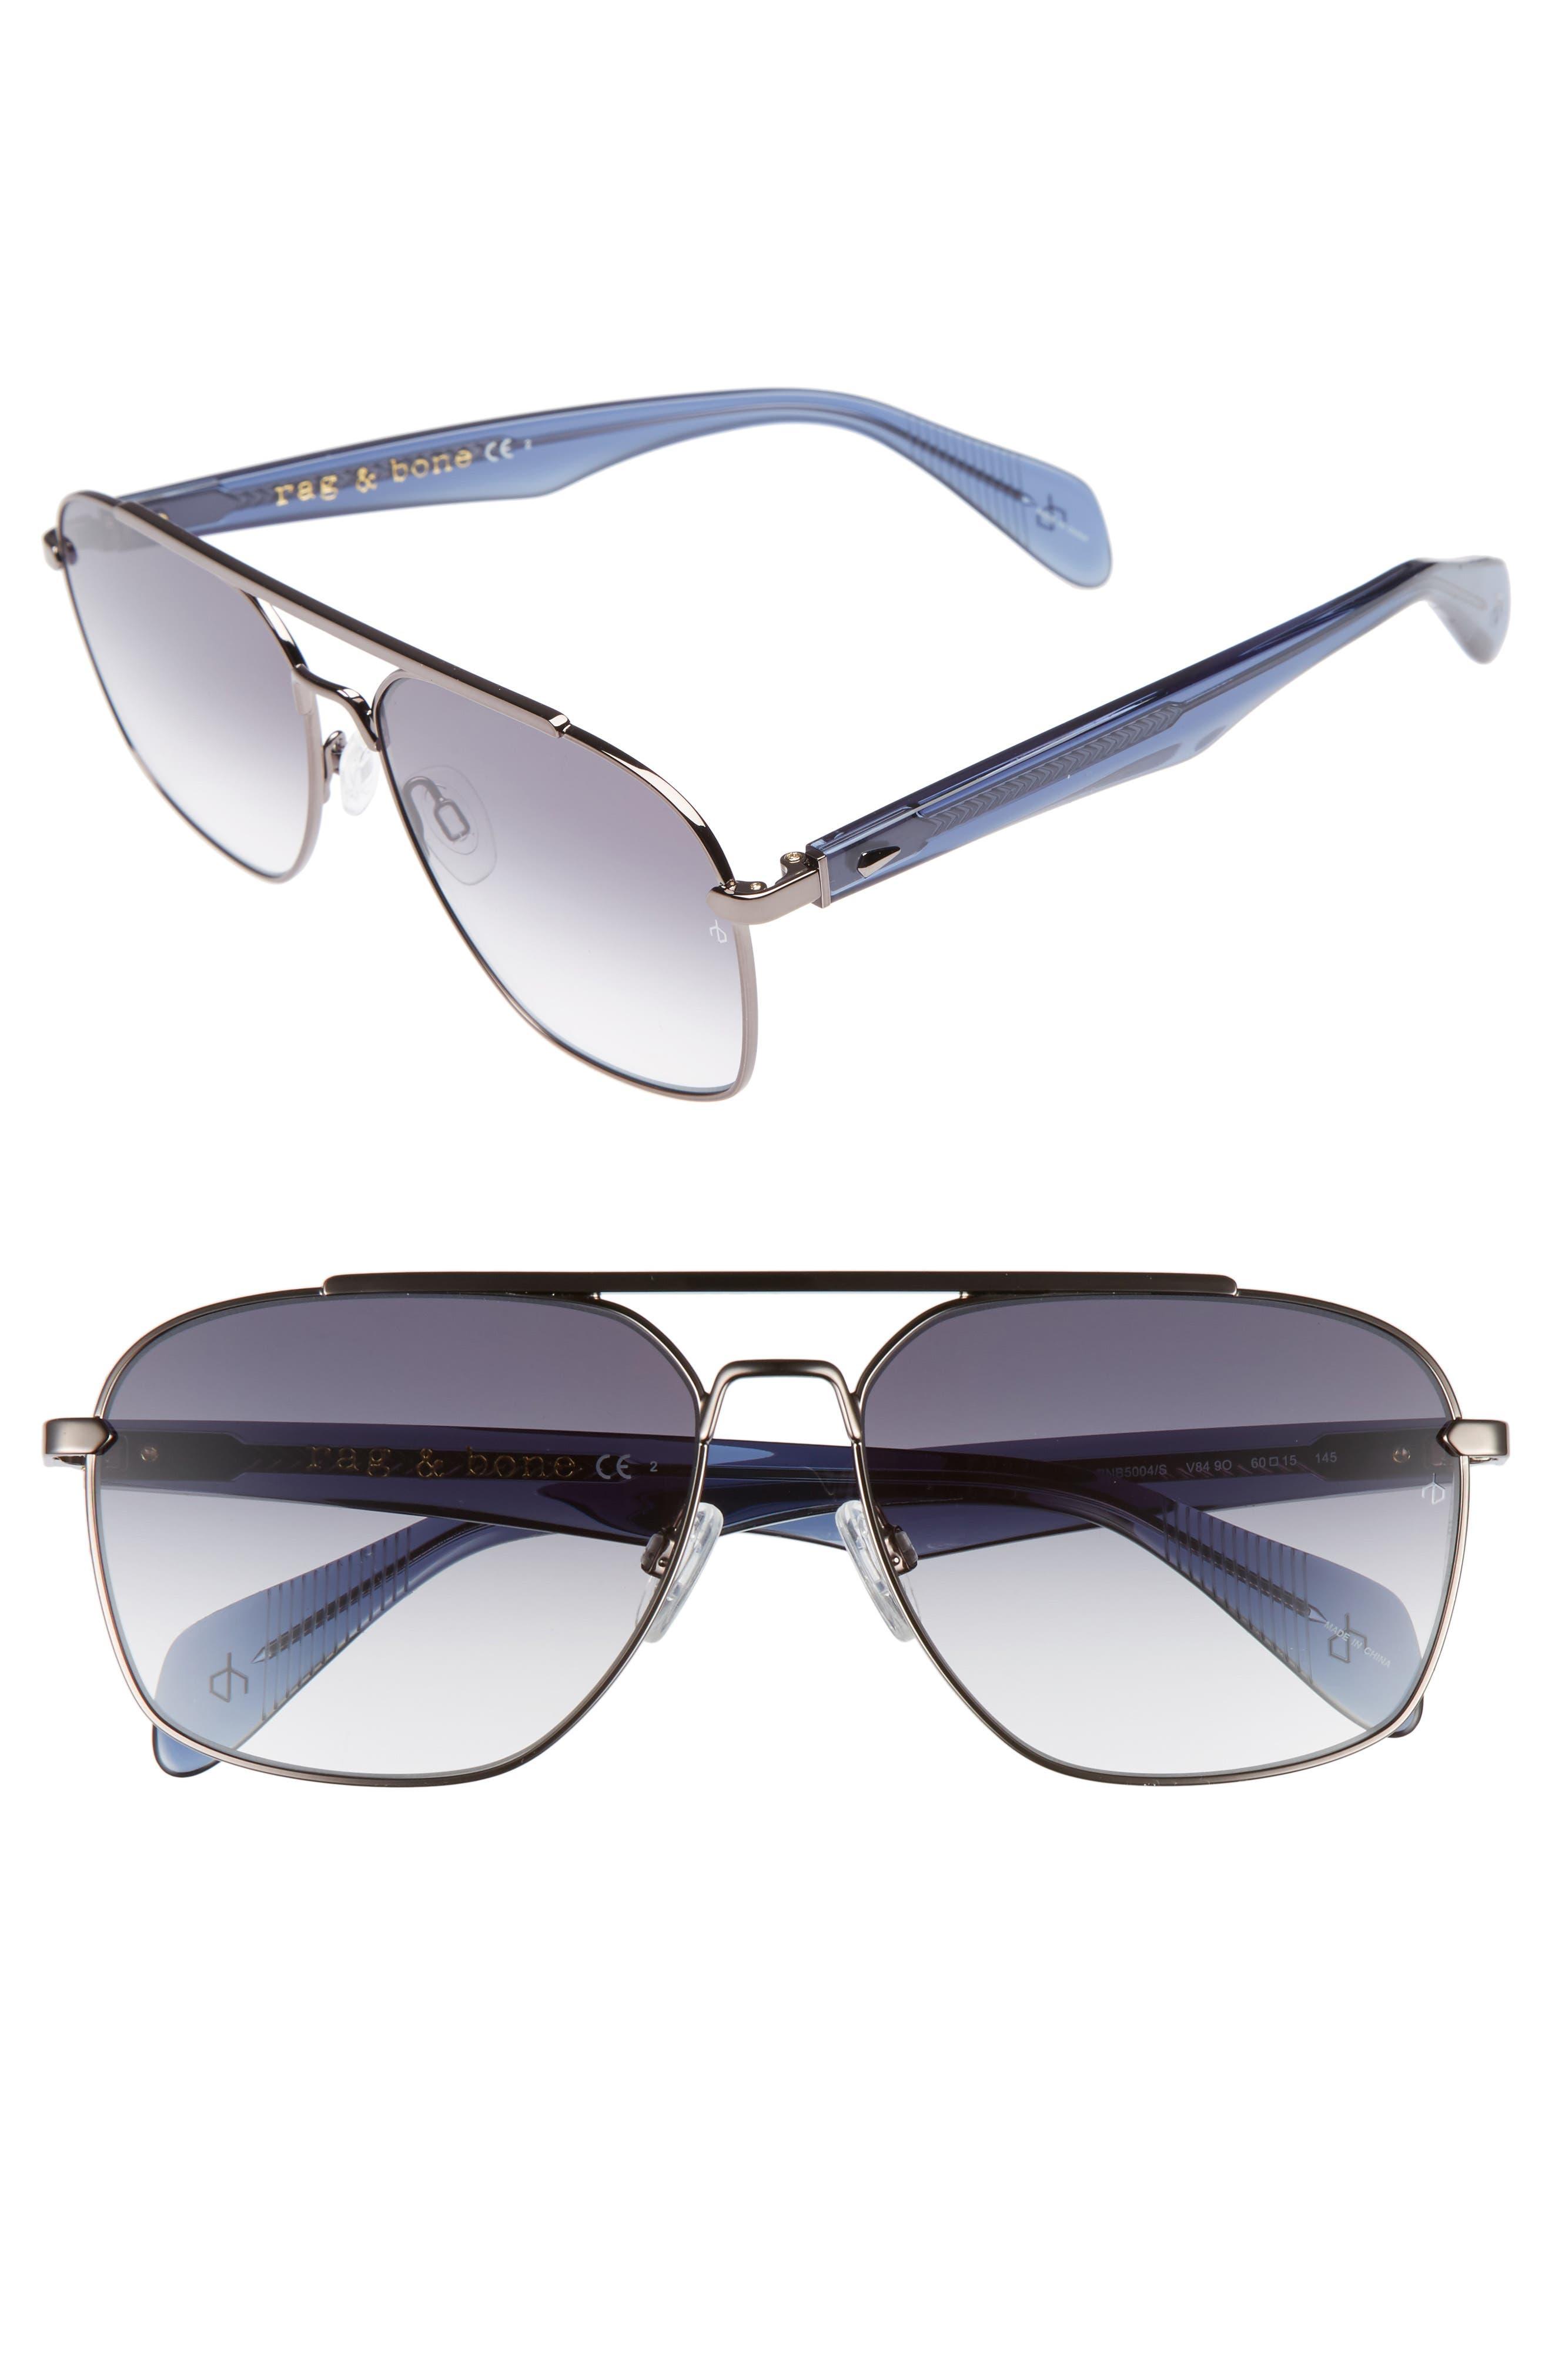 60mm Gradient Navigator Sunglasses,                         Main,                         color, Ruthenium Blue/ Grey